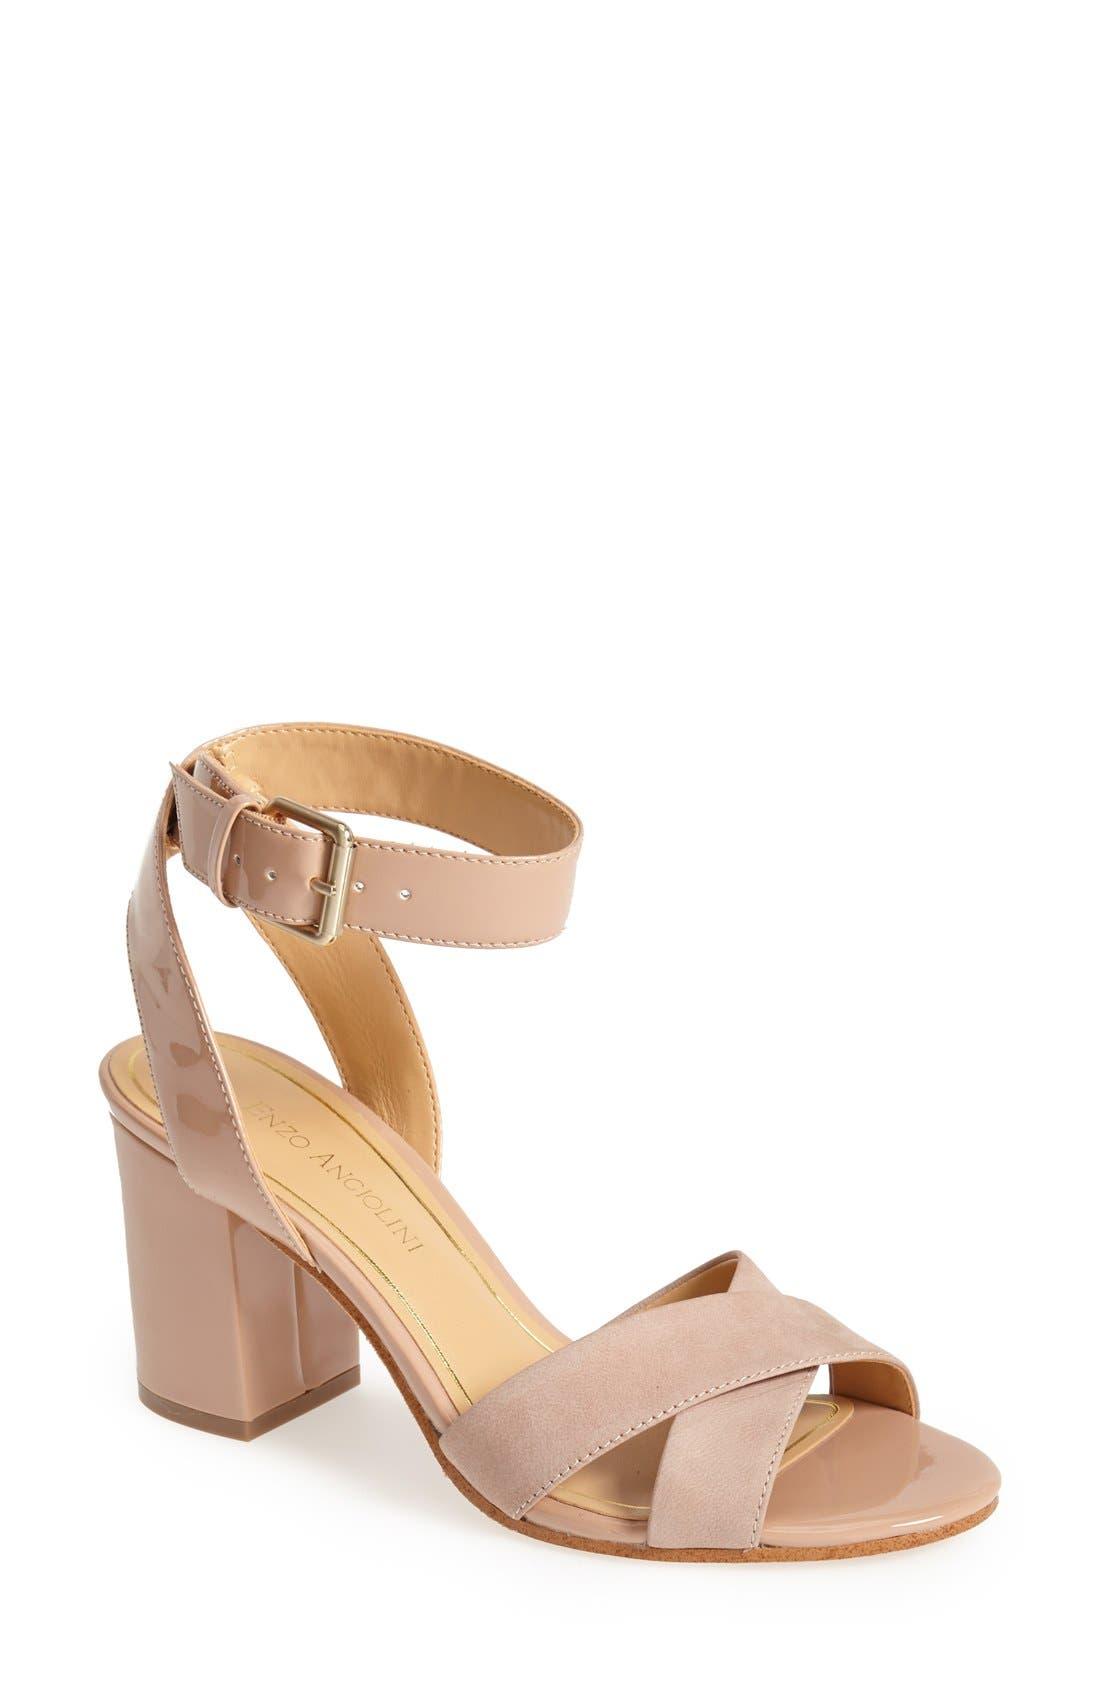 Main Image - Enzo Angiolini 'Gabele' Block Heel Sandal (Women)